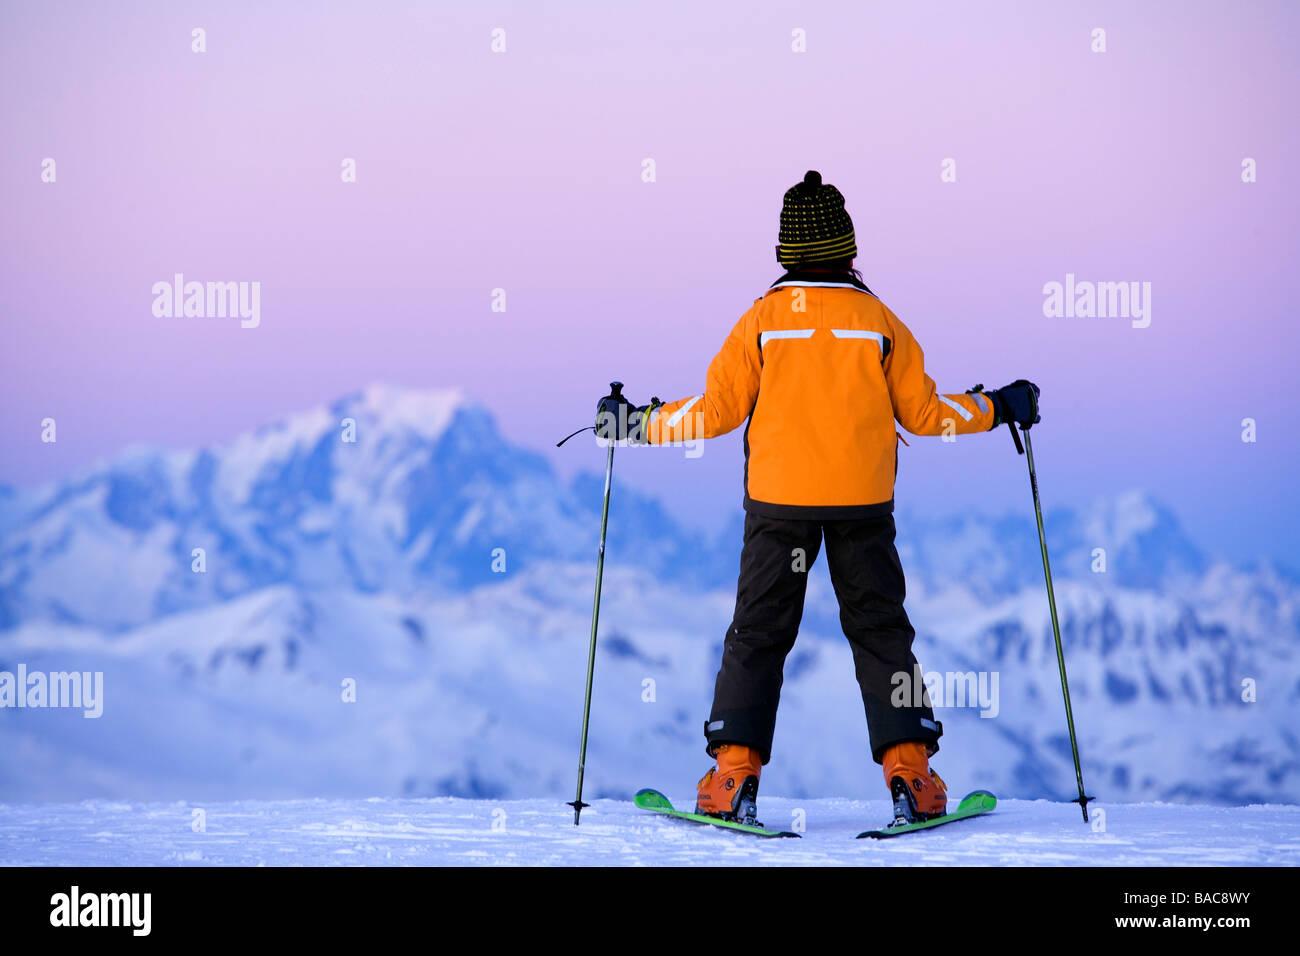 France, Savoie, Meribel, Les Menuires, the Mont Blanc from the Tougnete summit (Alt : 2434 m) - Stock Image